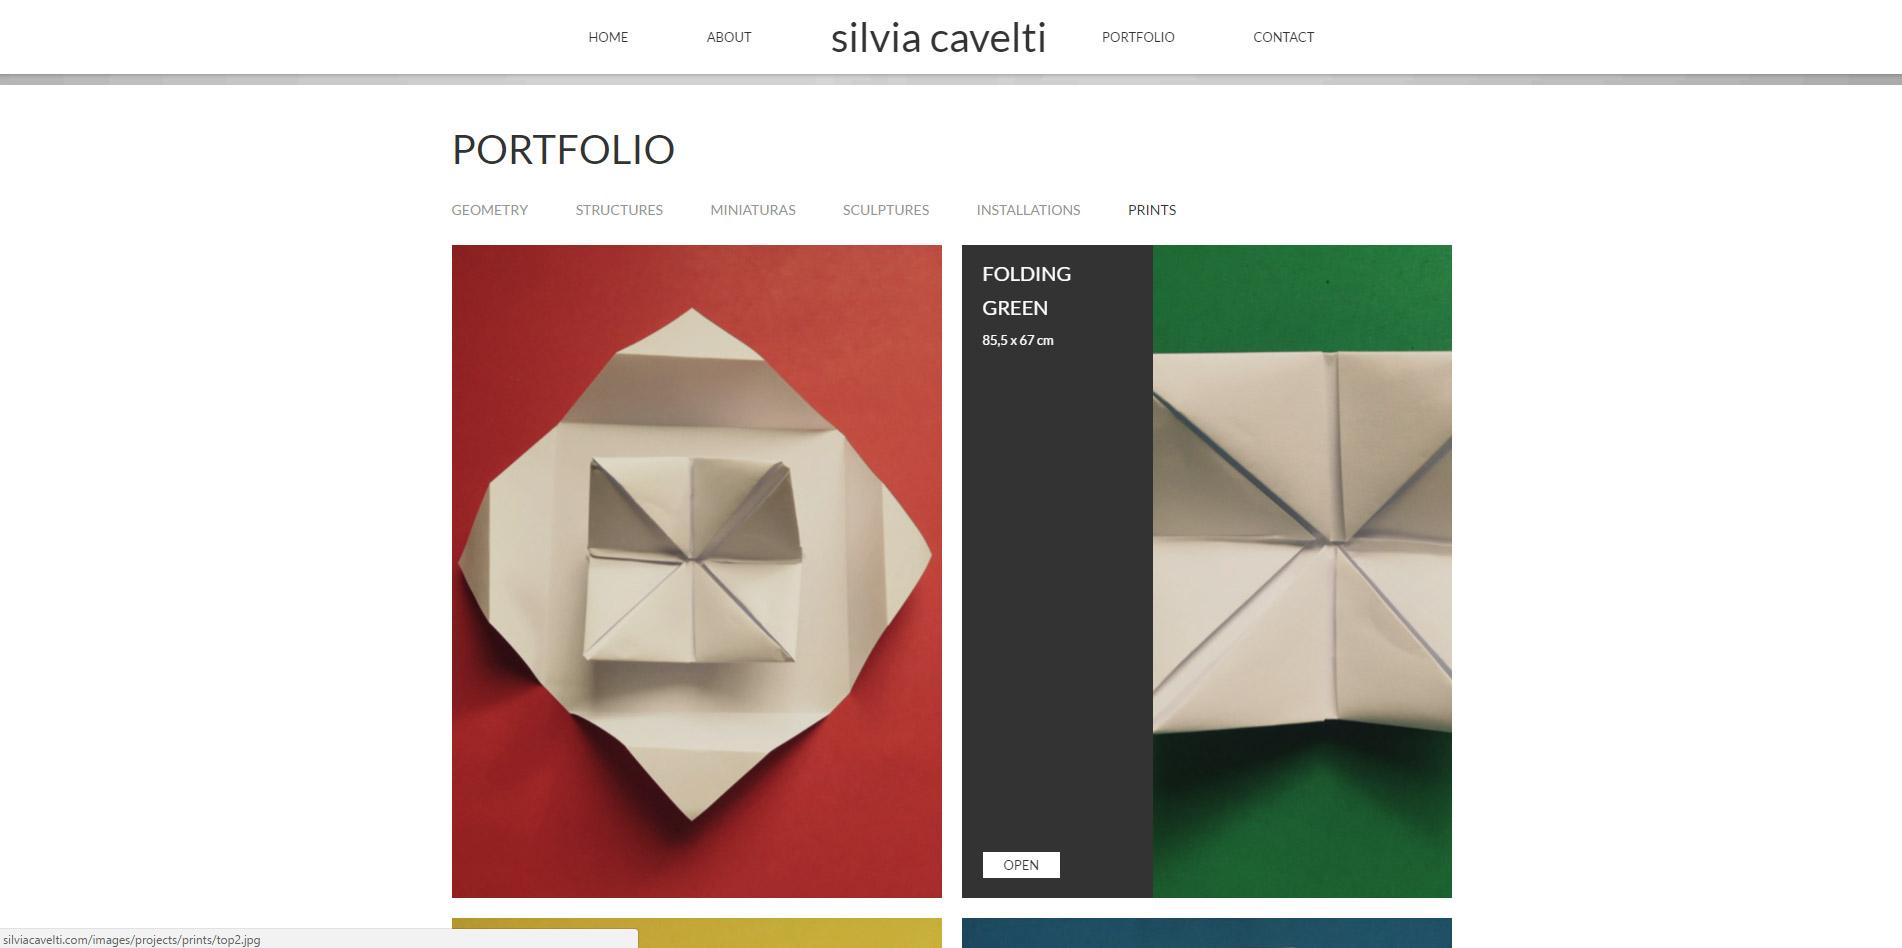 single page responsive web design for Algarve based artist Silvia Cavelti